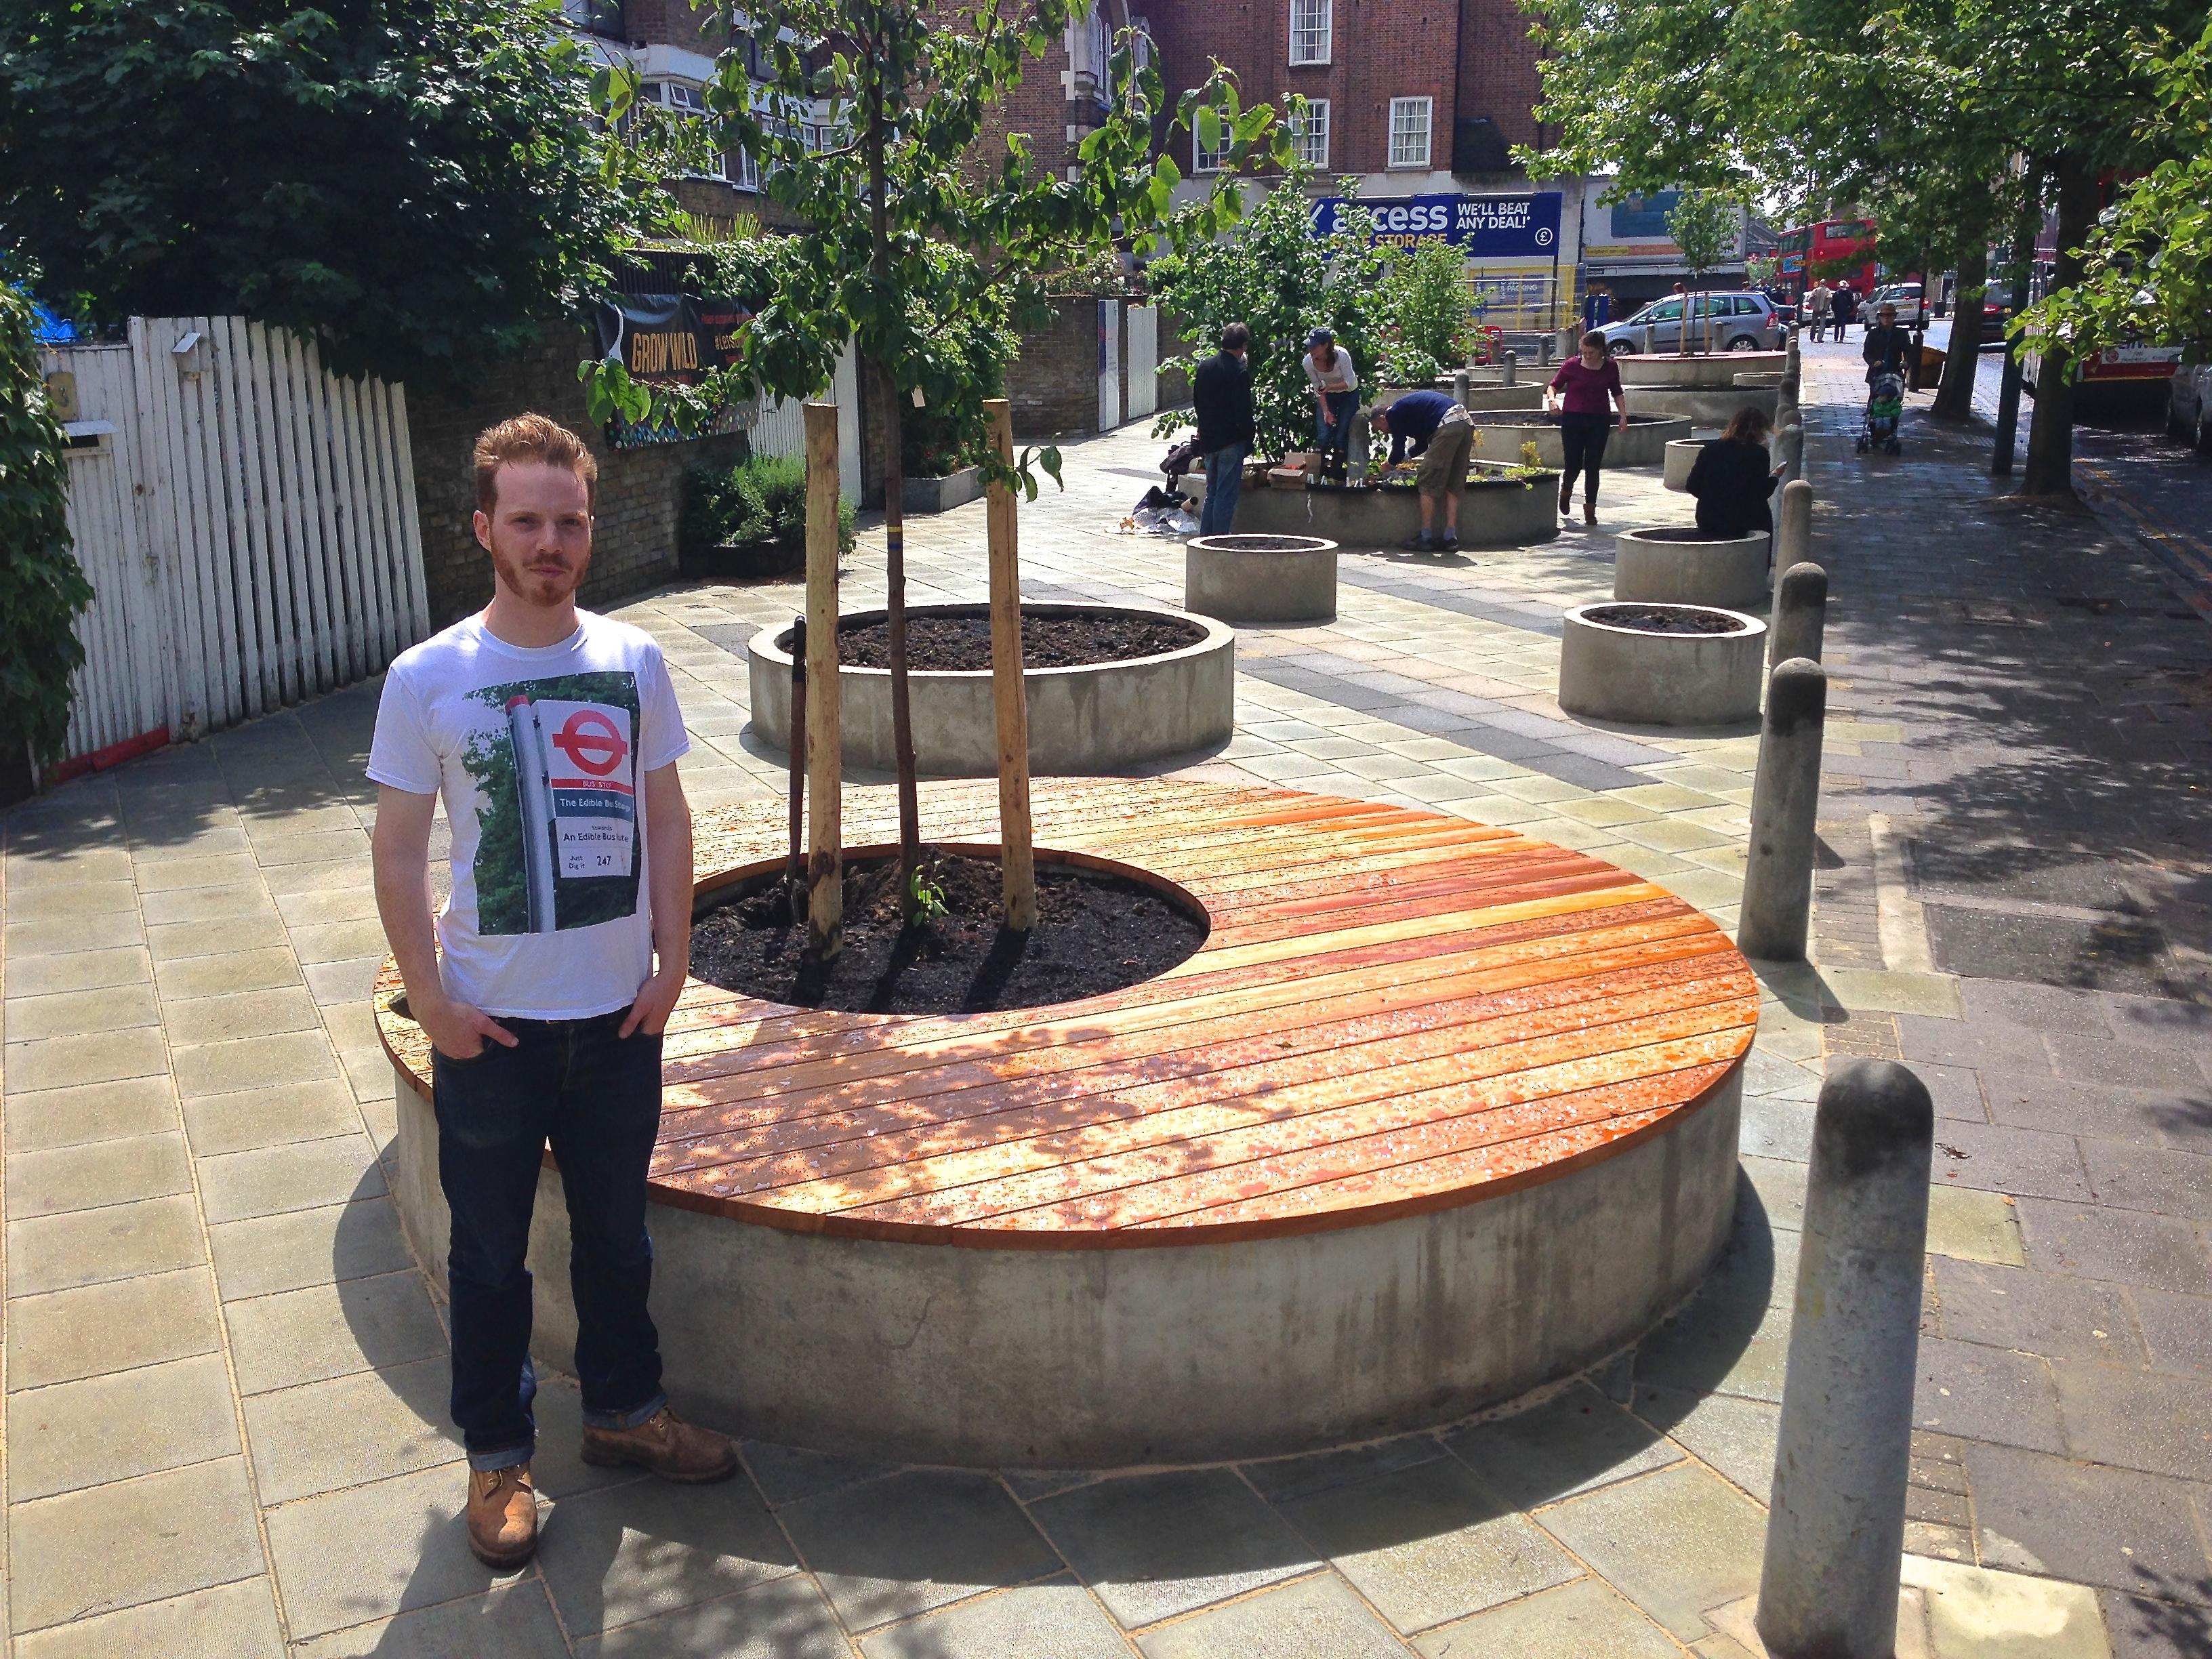 Will Sandy - Creative Director @ The Edible Bus Stop